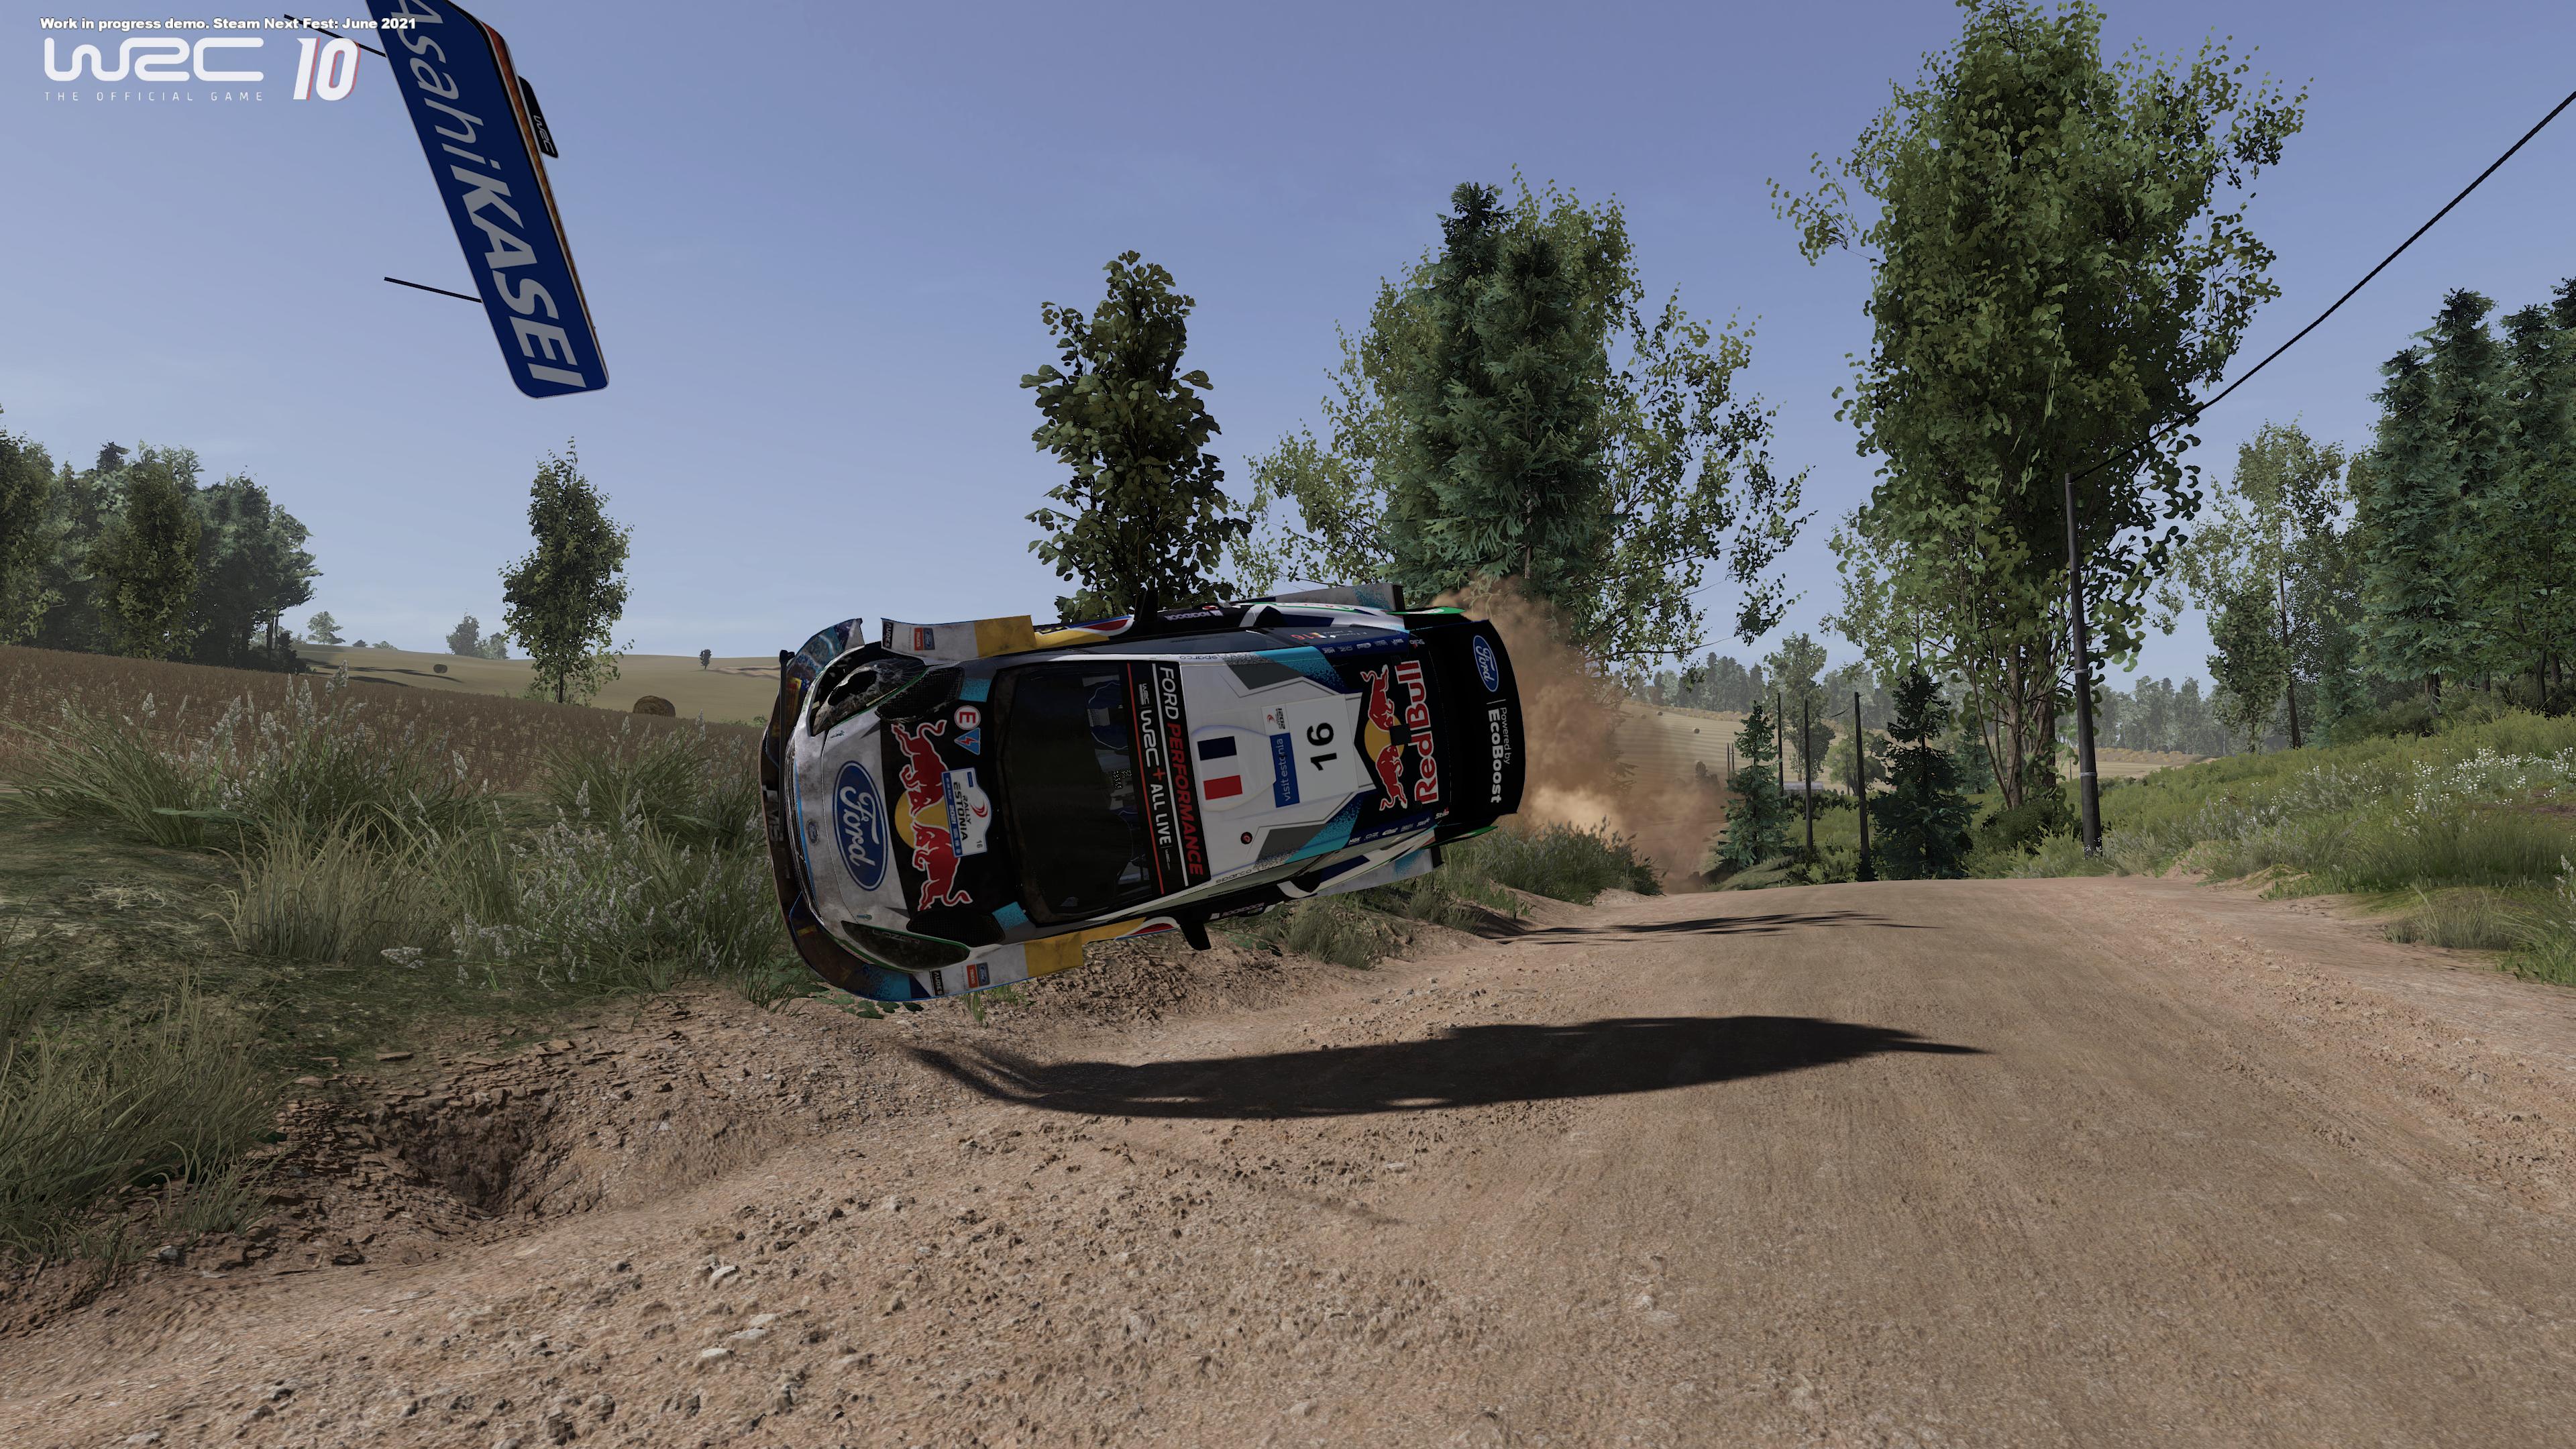 Wrc 10 Fia World Rally Championship Demo Screenshot 2021.06.12 - 13.40.54.89